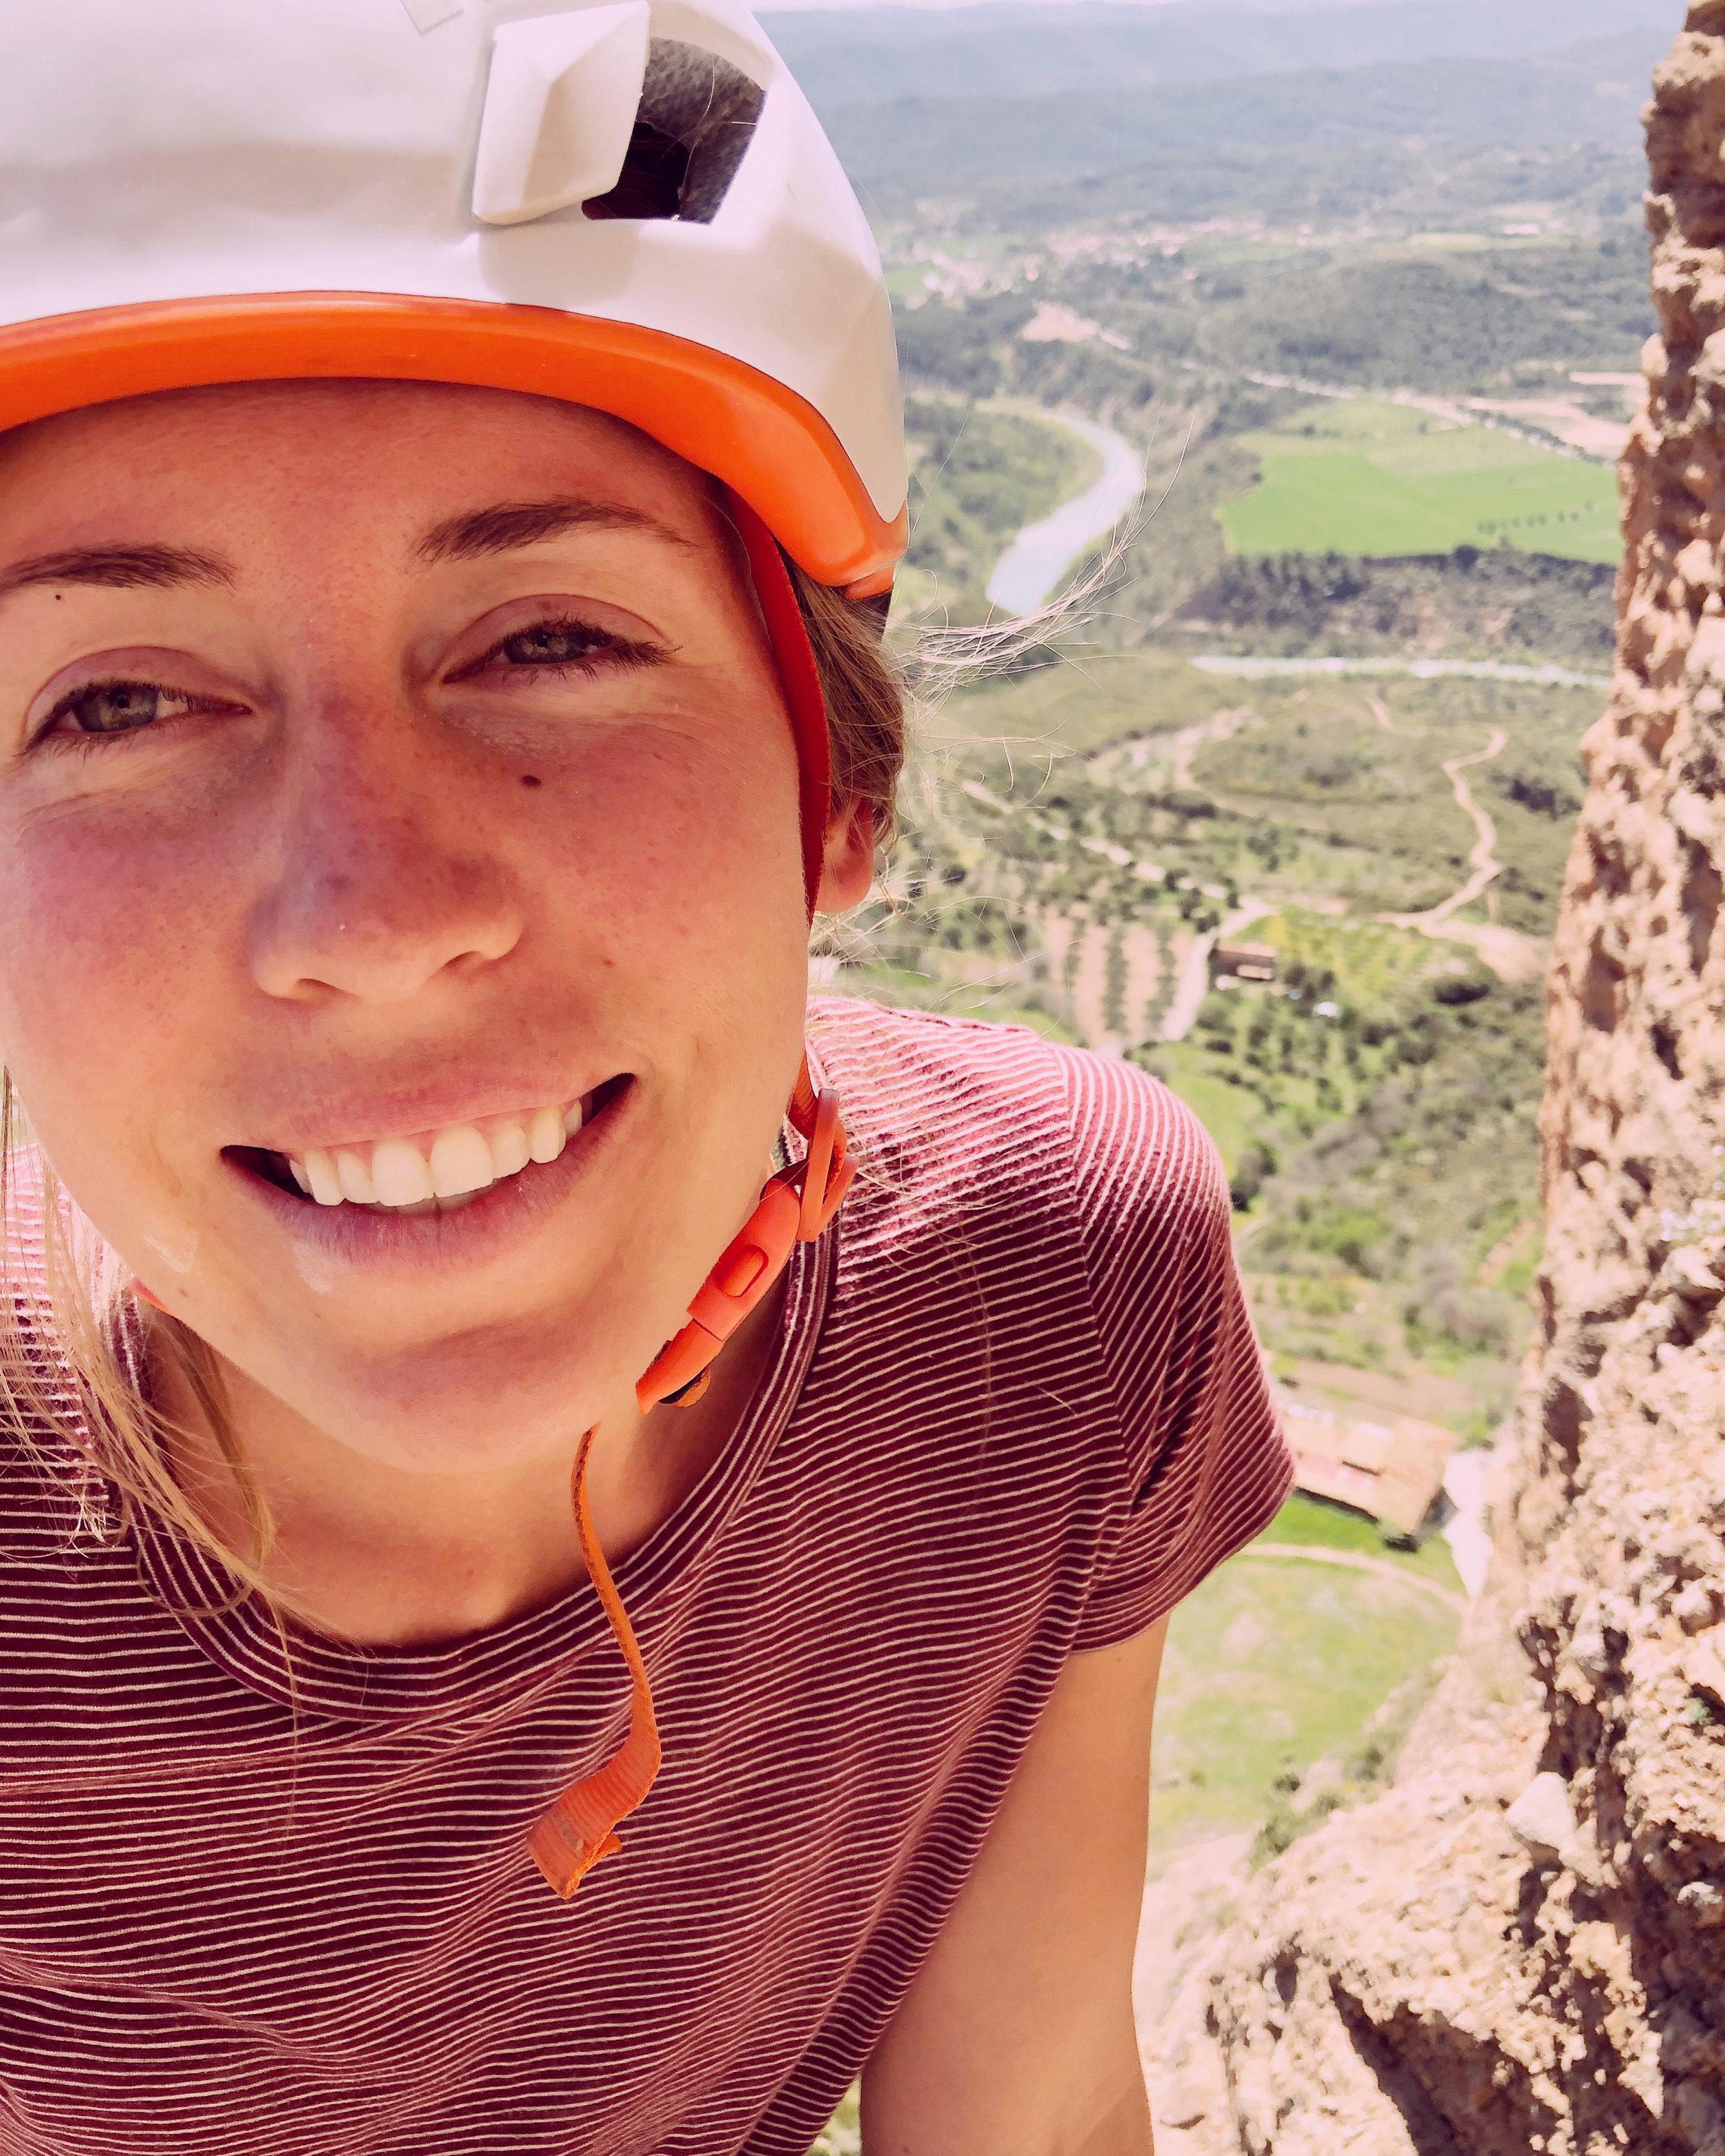 climbinginspain-28.jpg